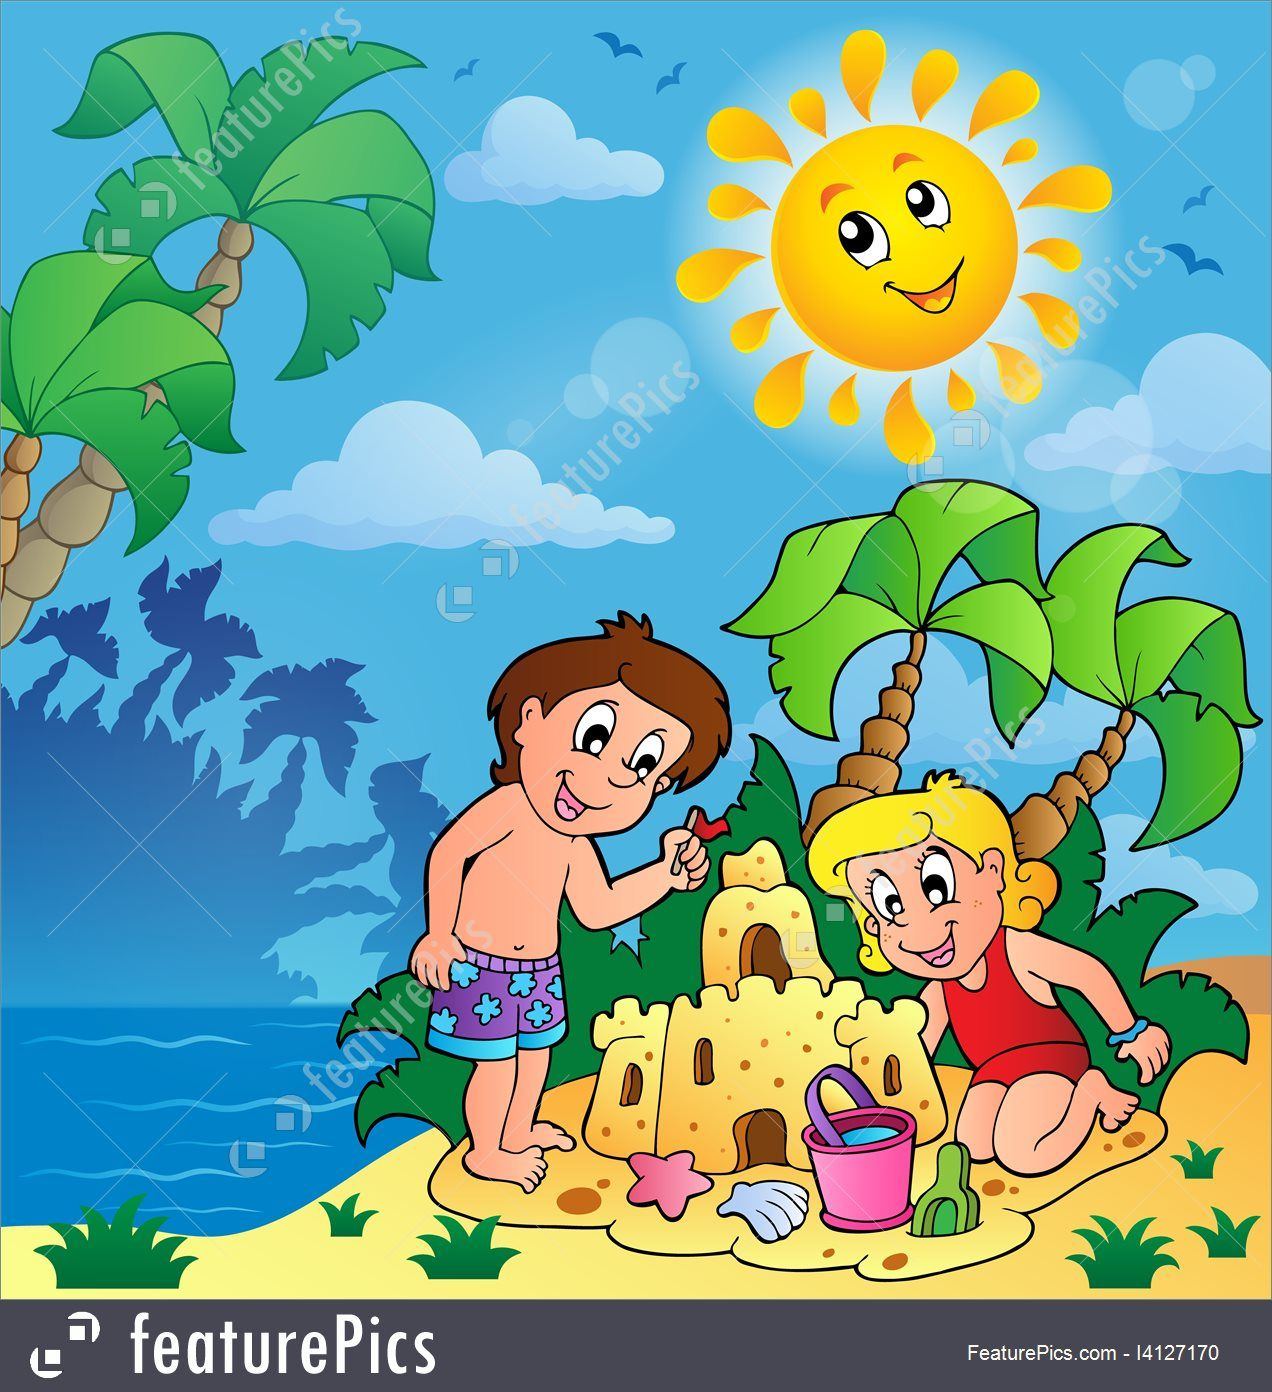 Images for children theme. Clipart summer summer season